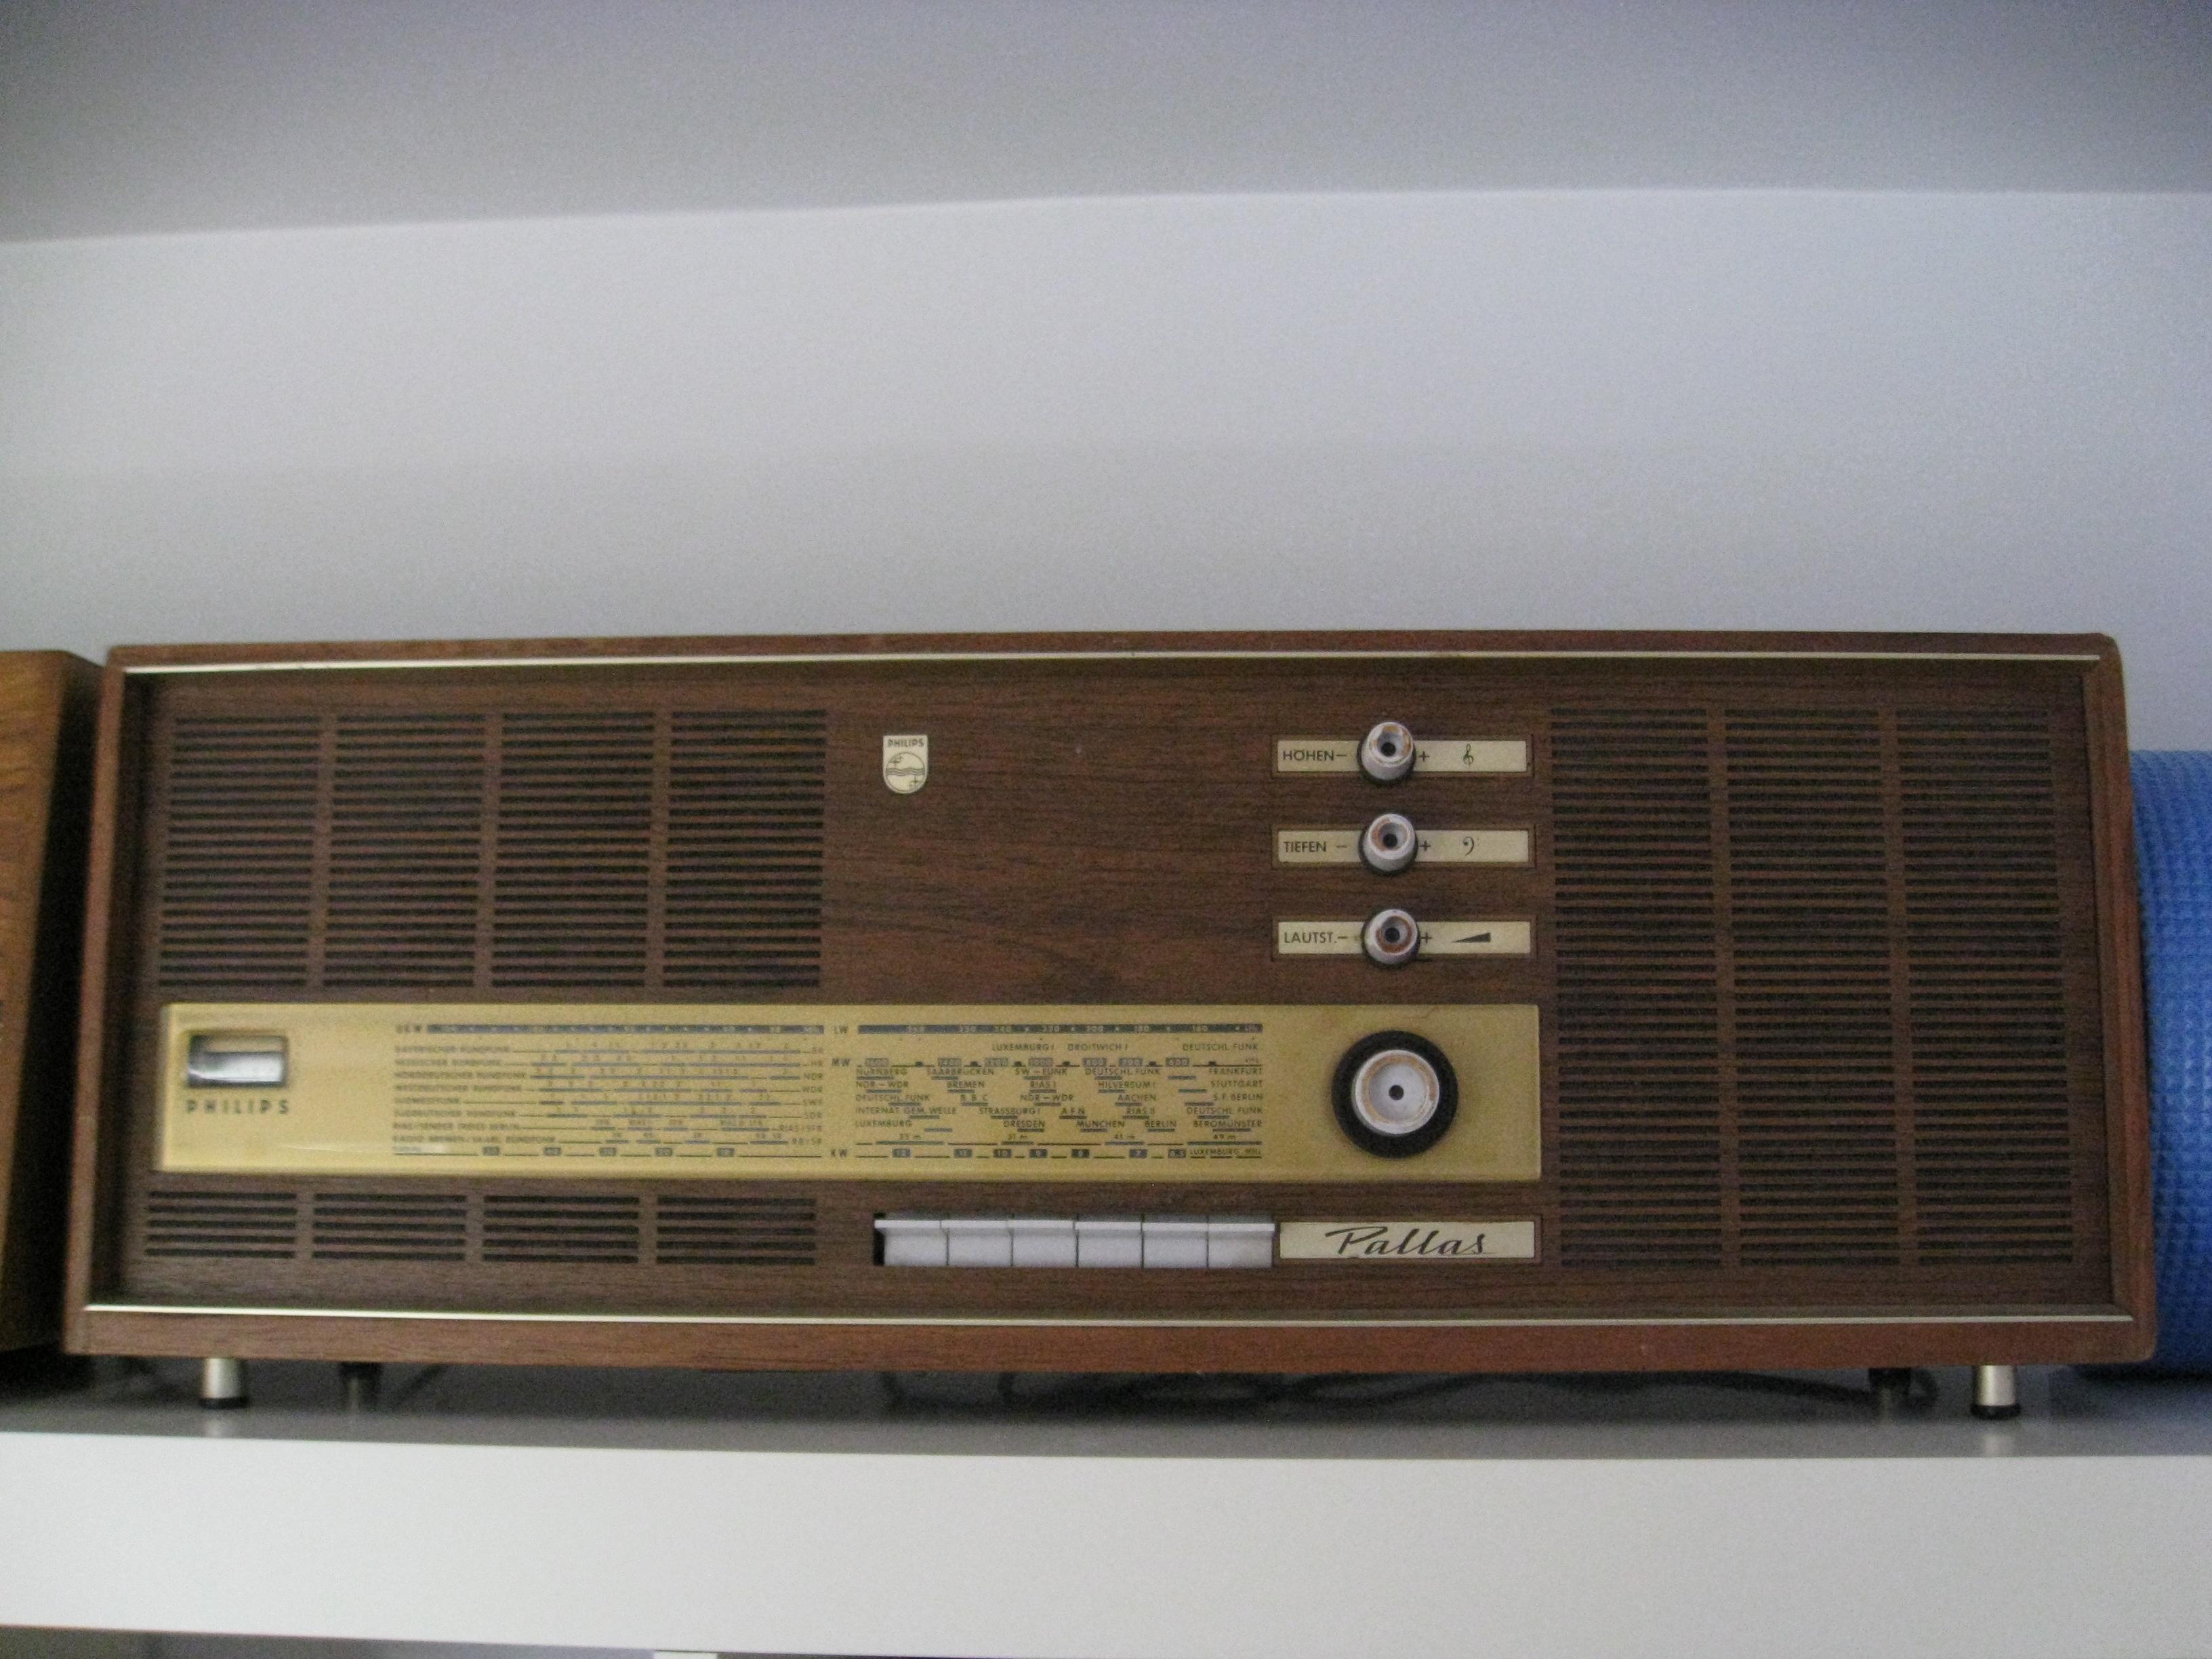 Reparacion Radios Antiguas Phillips Pallas Radioexperto.com